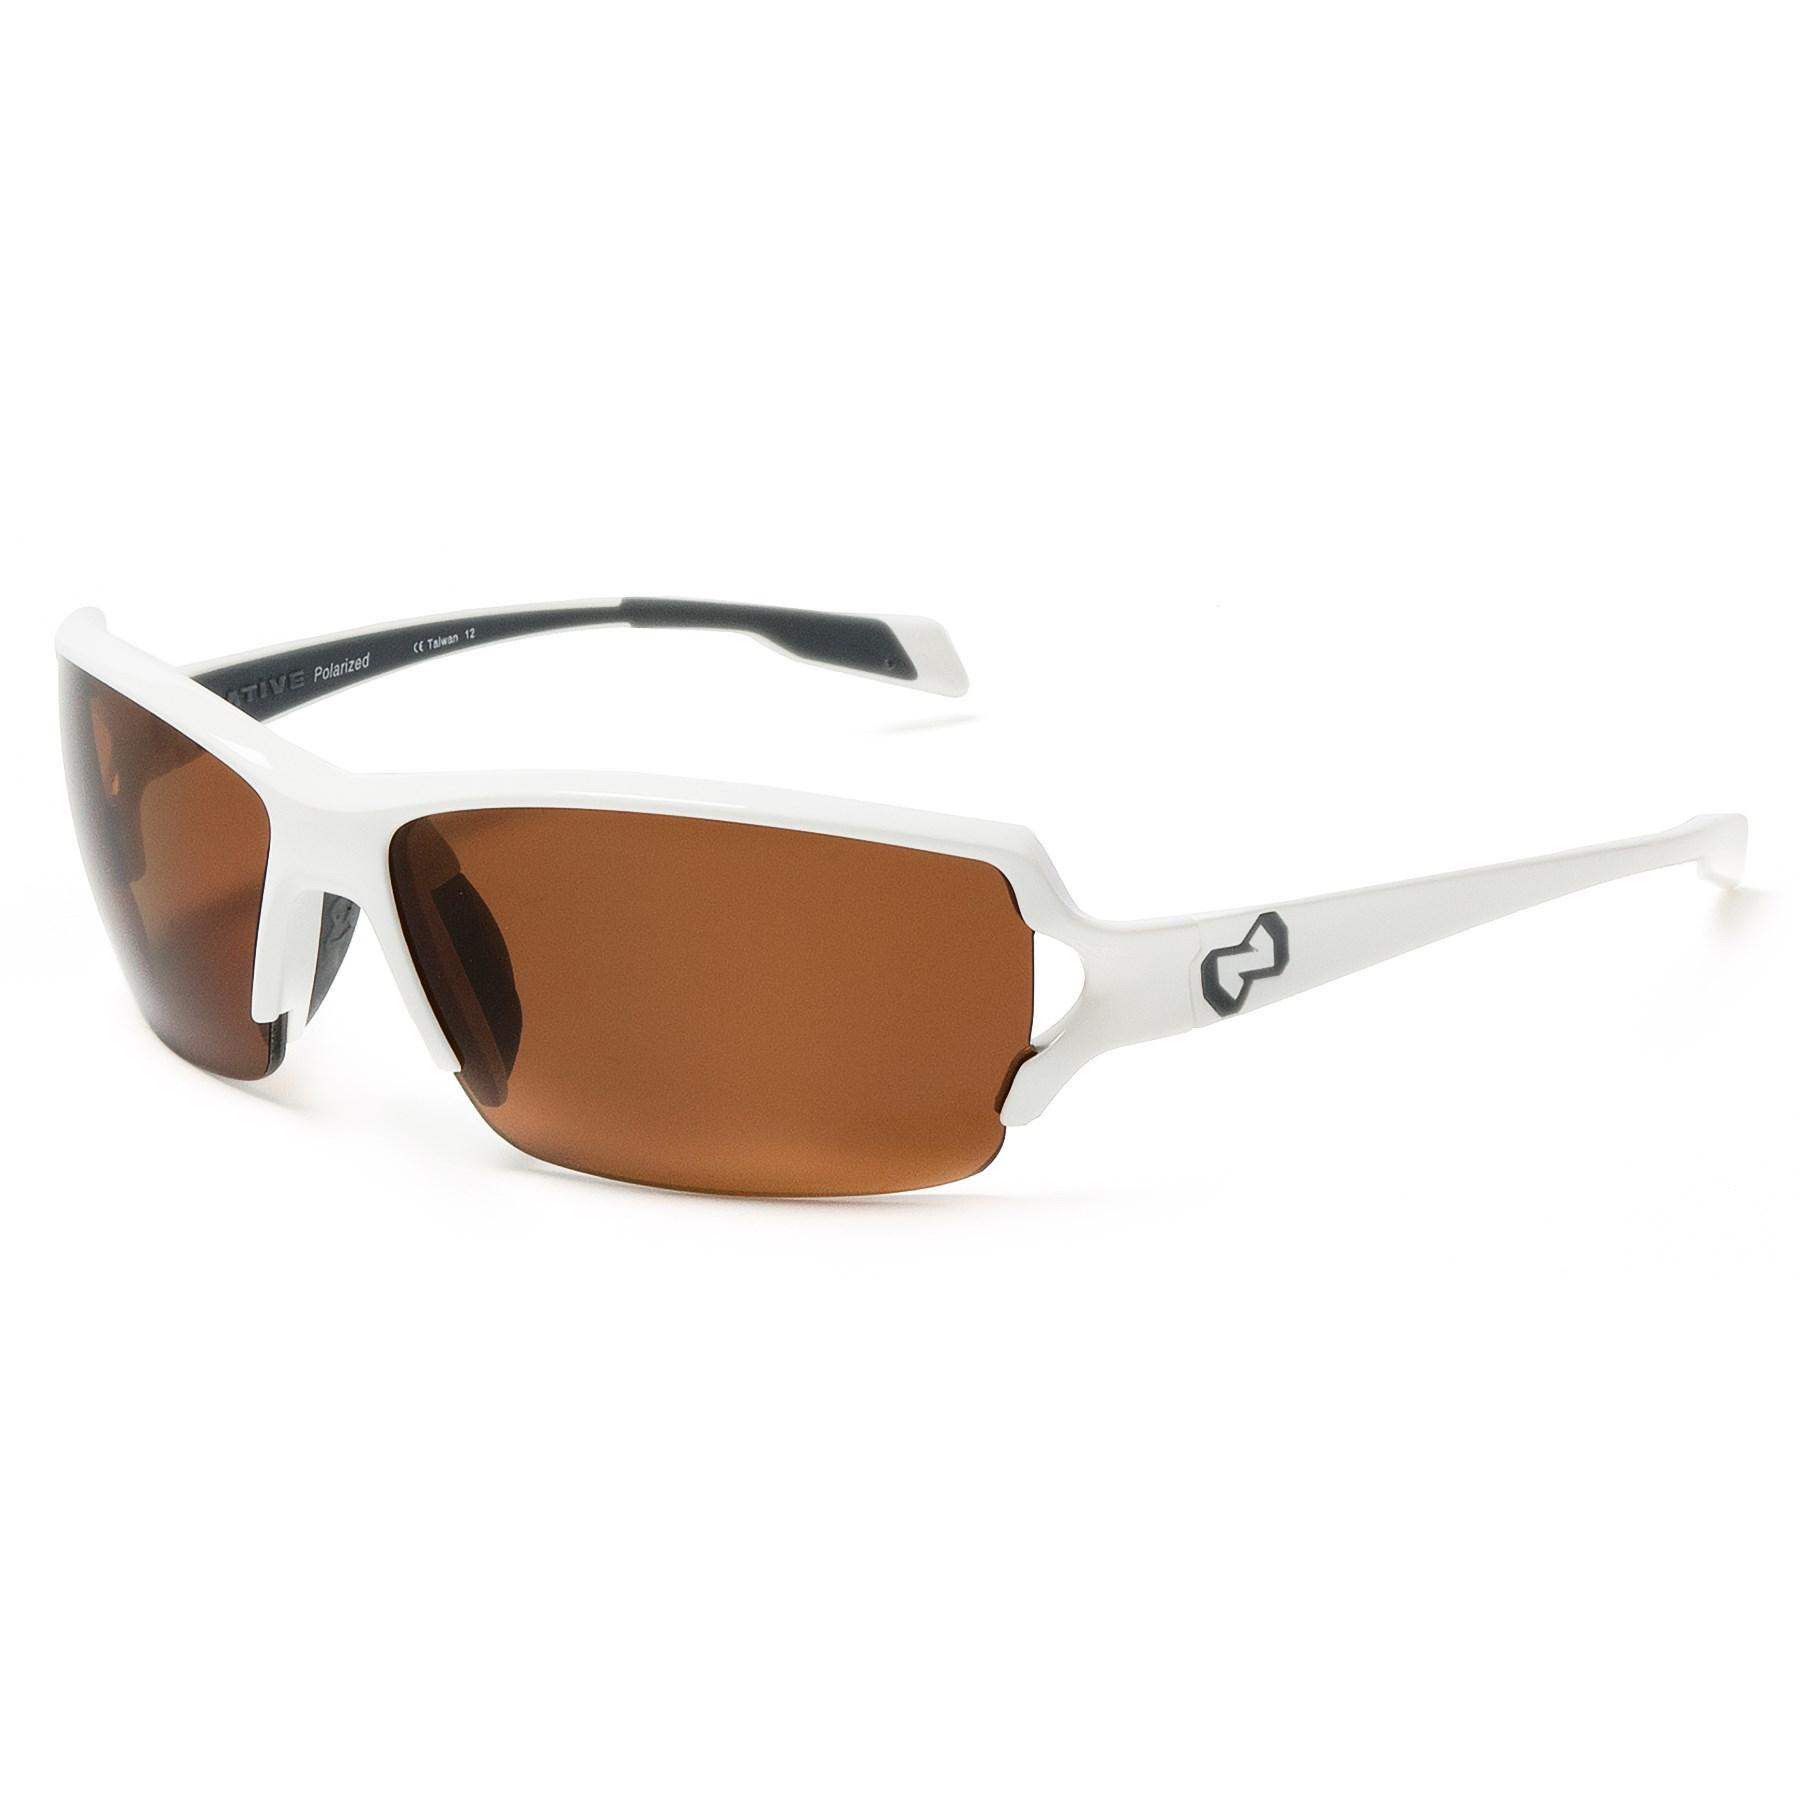 7b726d4af7 Lyst - Native Eyewear Blanca Sunglasses in Brown for Men